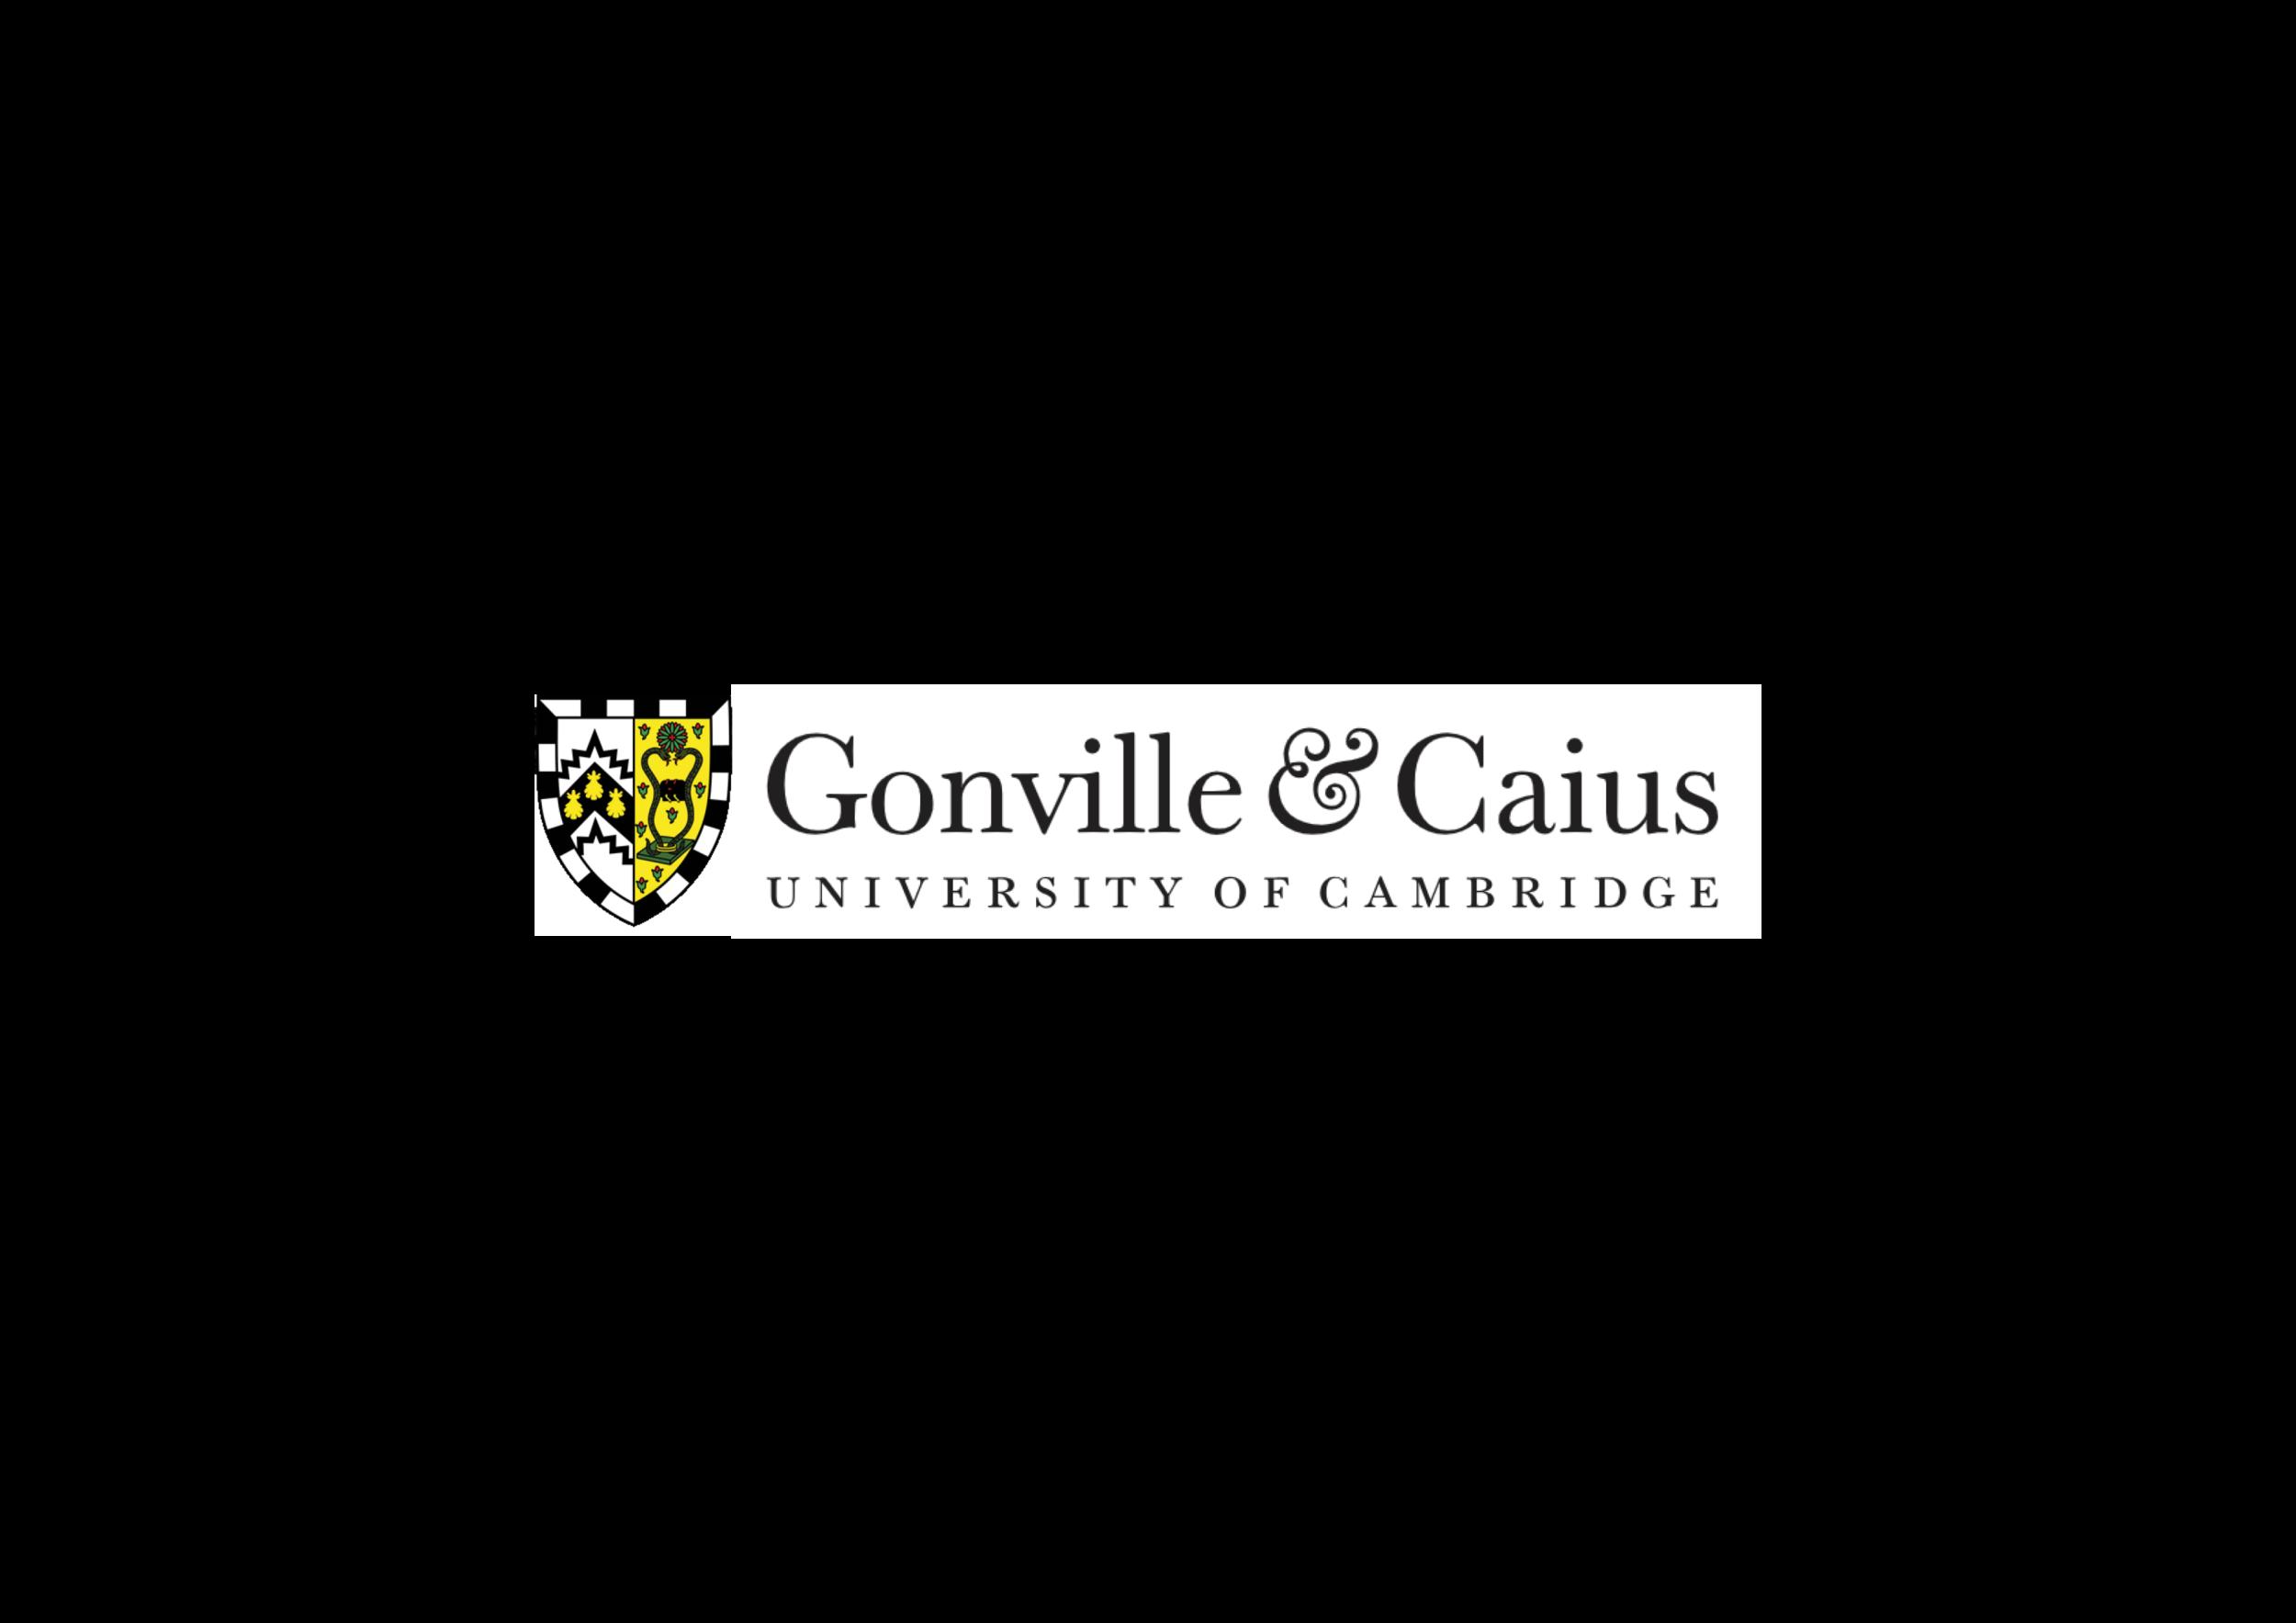 G&C cambridge logo.png